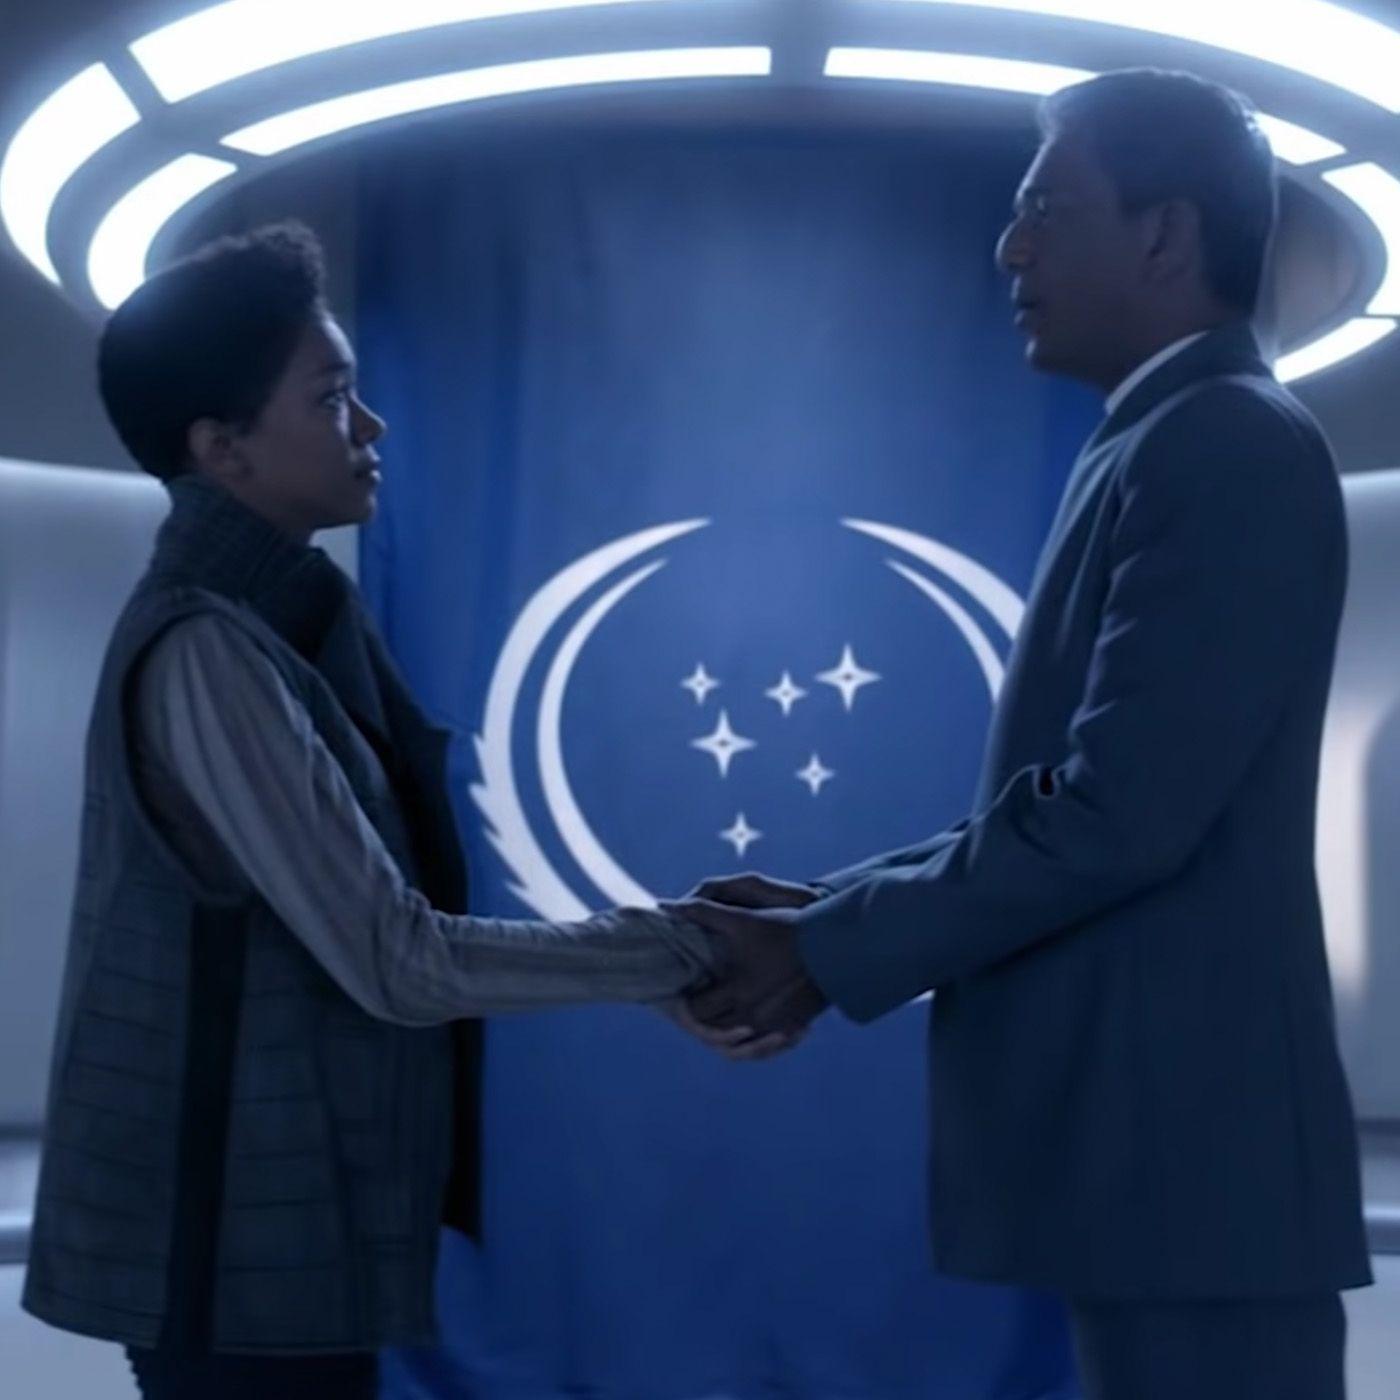 19. The Road to Star Trek: Discovery S3 - Trailer #1 Breakdown